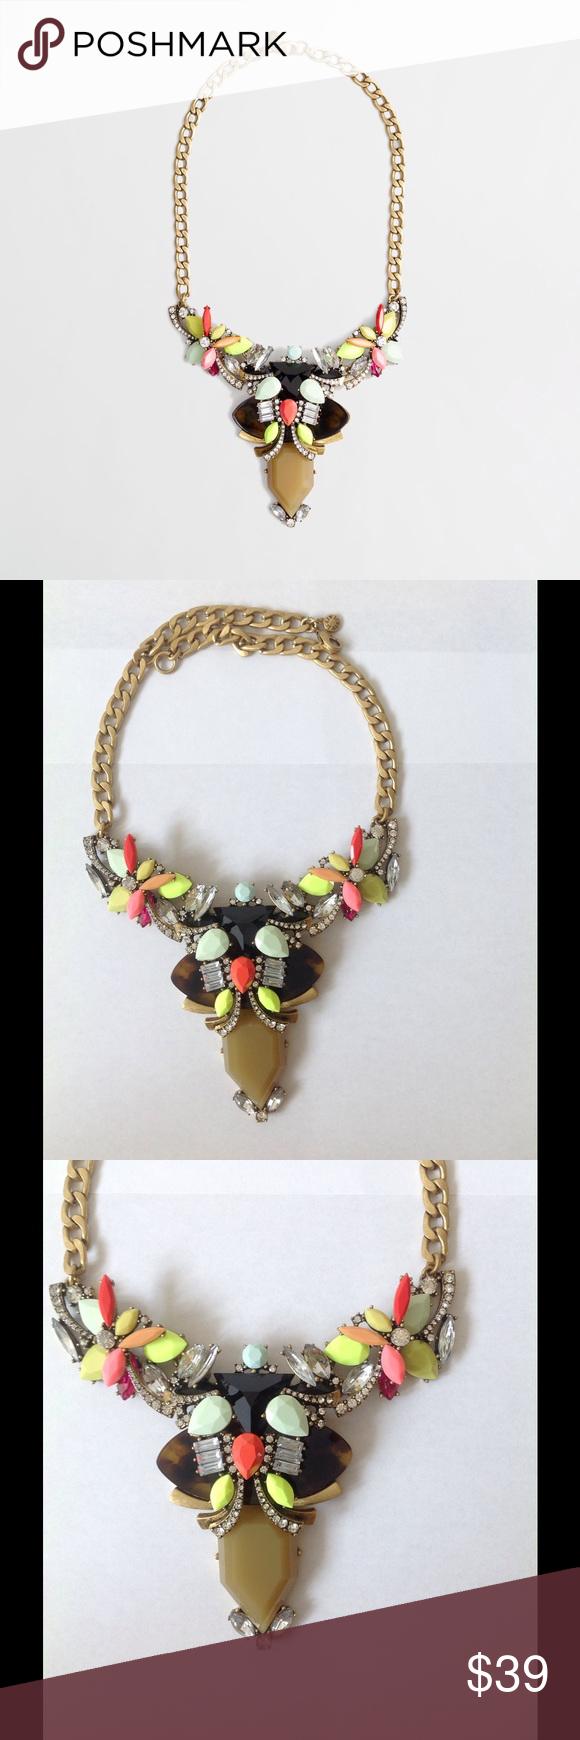 Sold j crew neon pendant necklace my posh picks pinterest